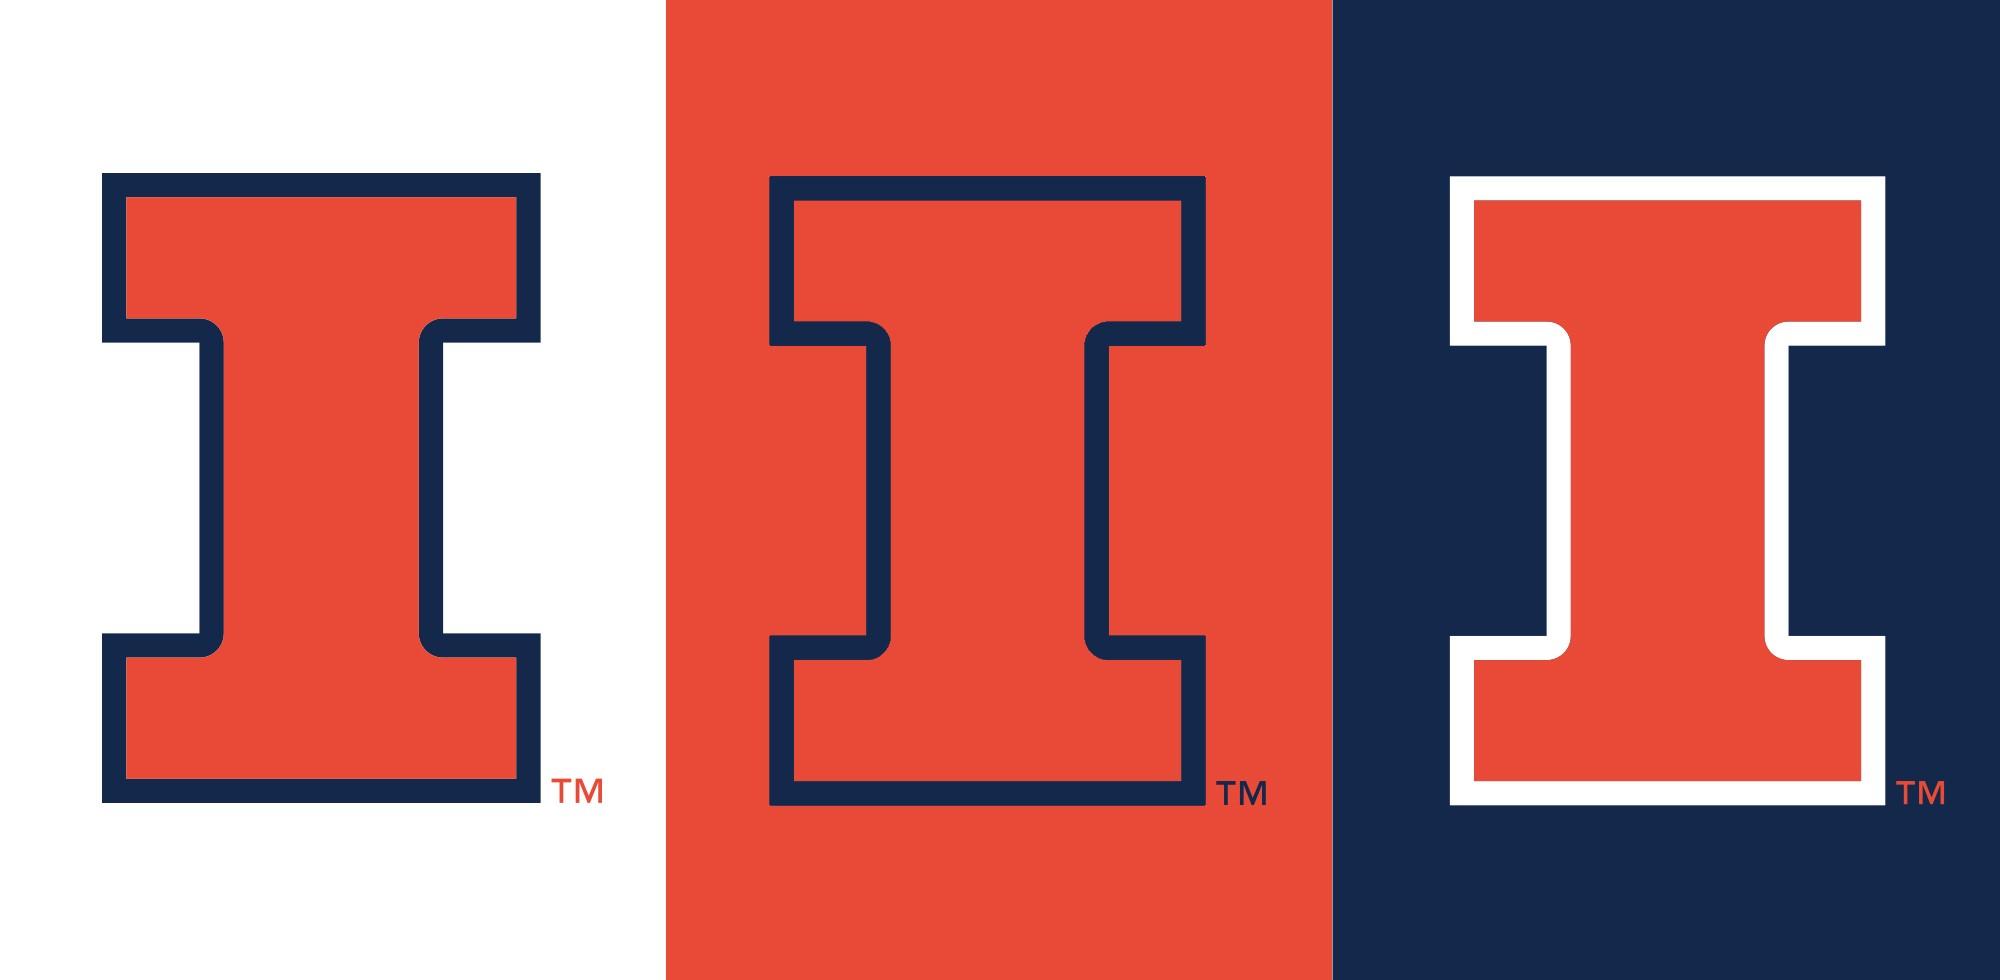 blocki-logos.jpg